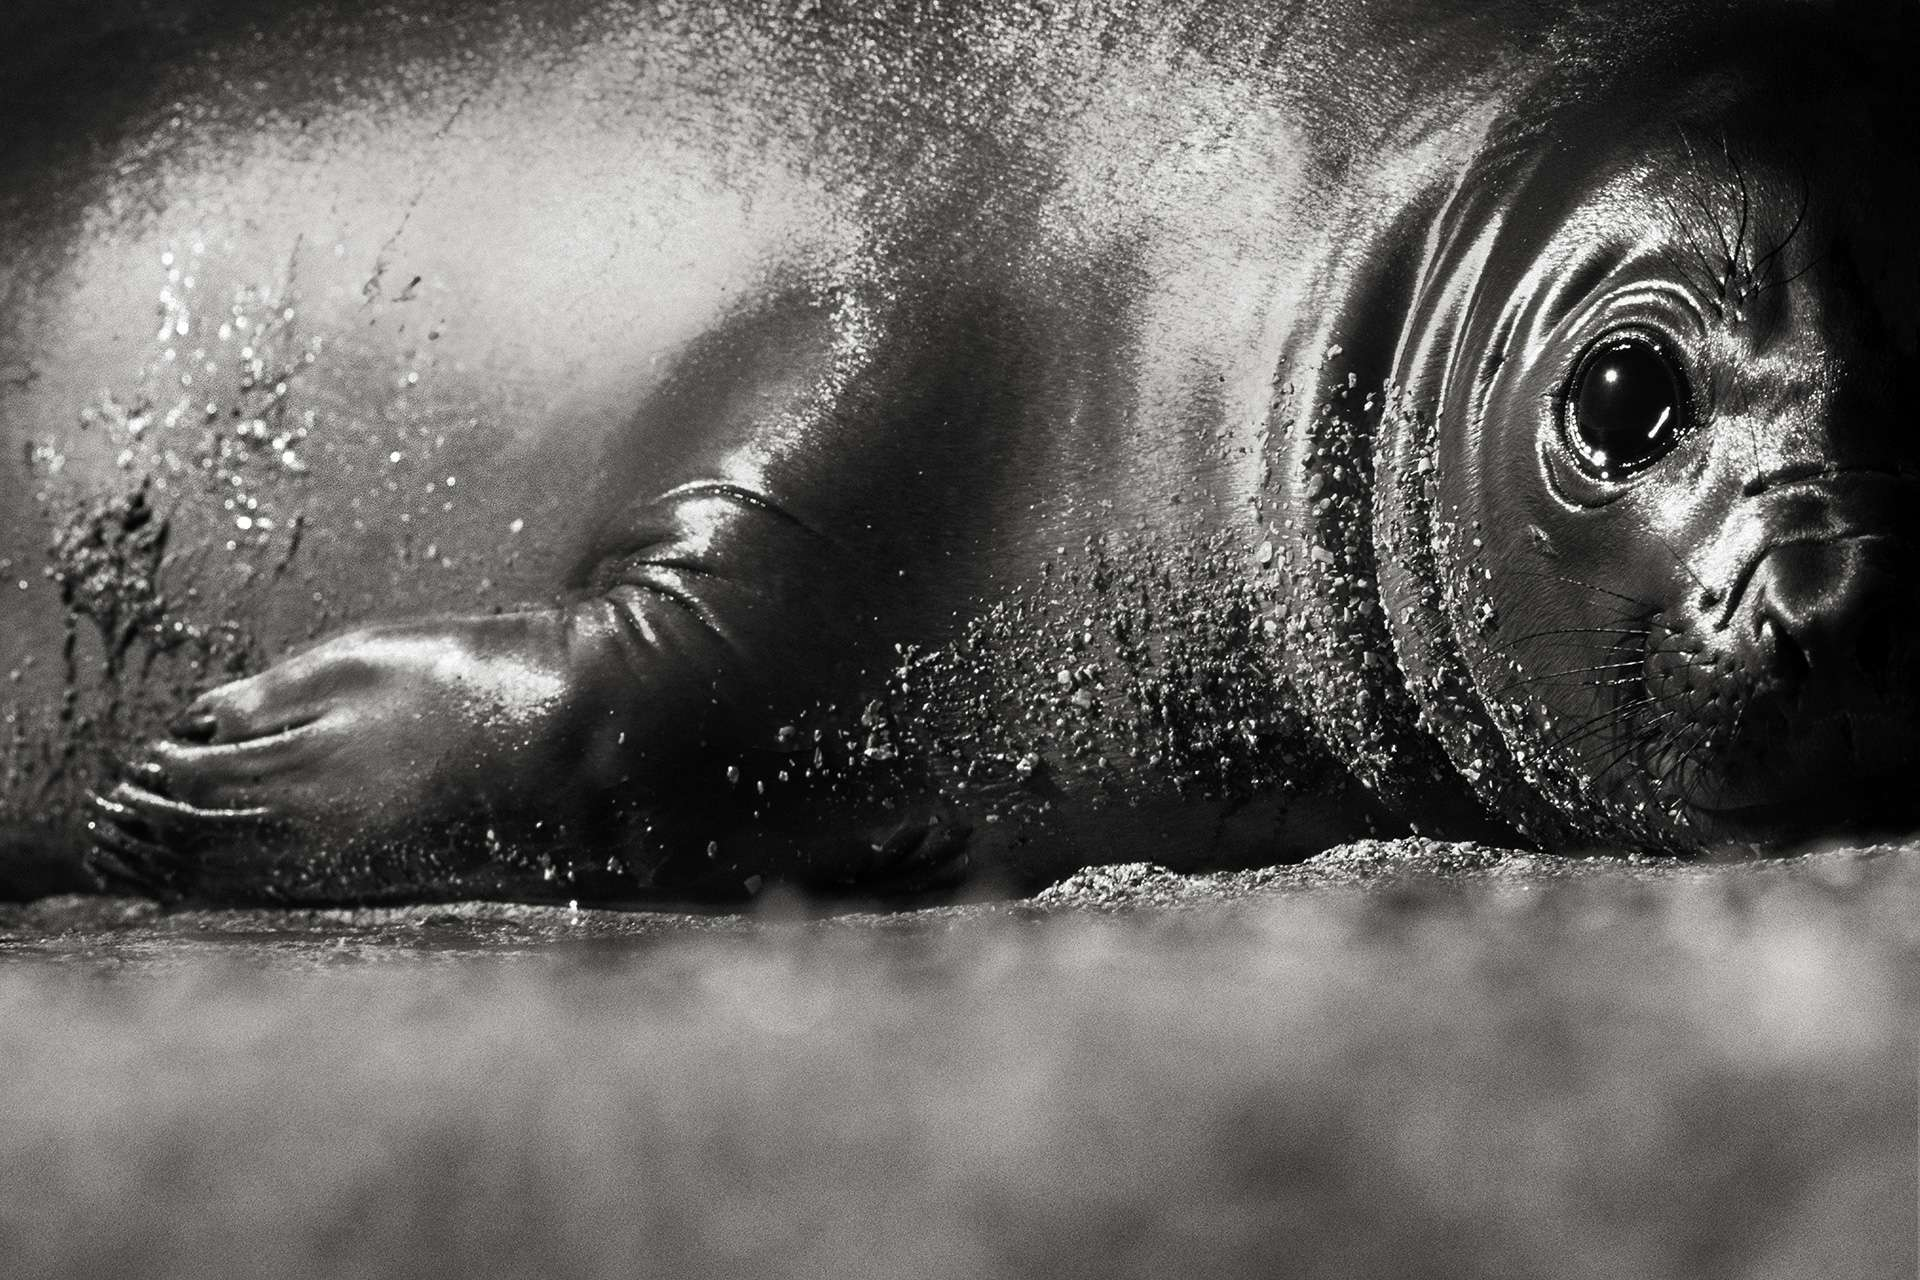 Photographie de Gilles Martin : éléphant de mer (mirounga) d'Argentine, Struggle For Life